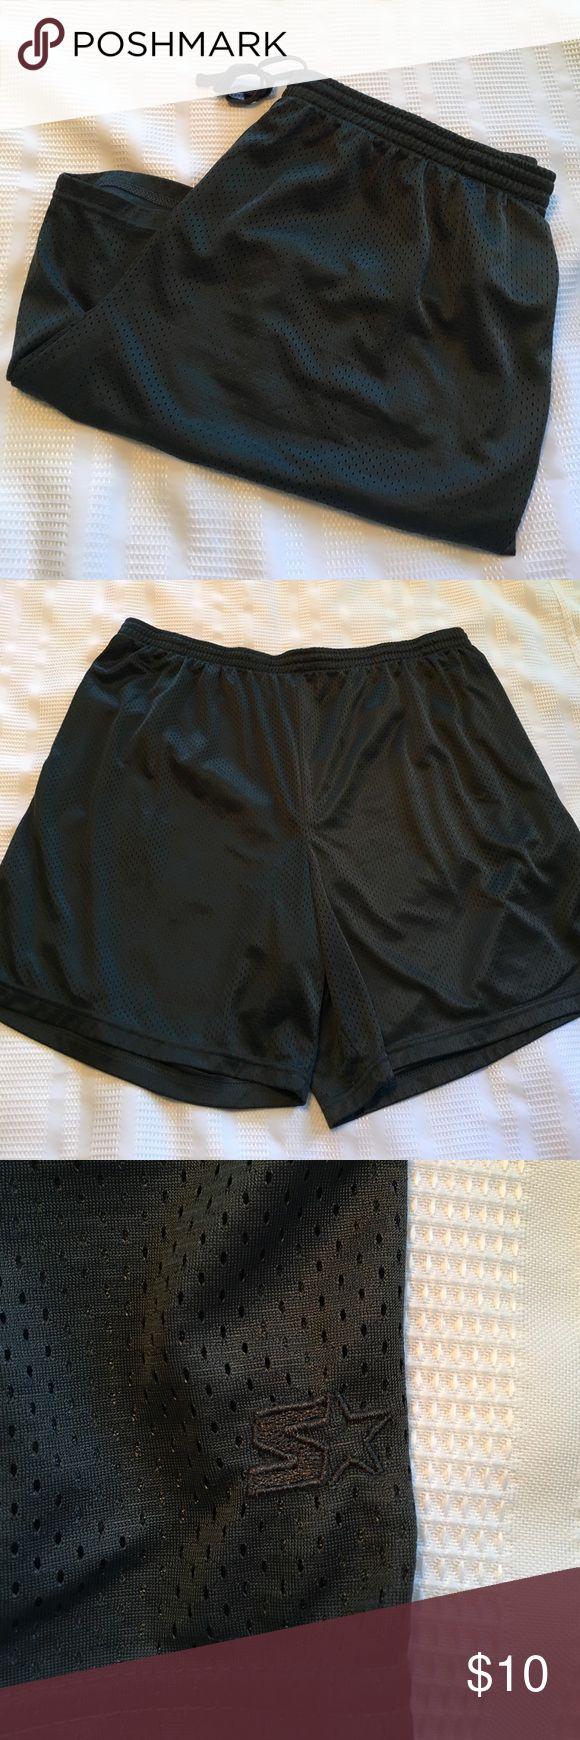 "Starter Dark Gray Athletic Shorts Dark gray. Drawstring close. Two front pockets. 7.5"" inseam. Starter Shorts Athletic"